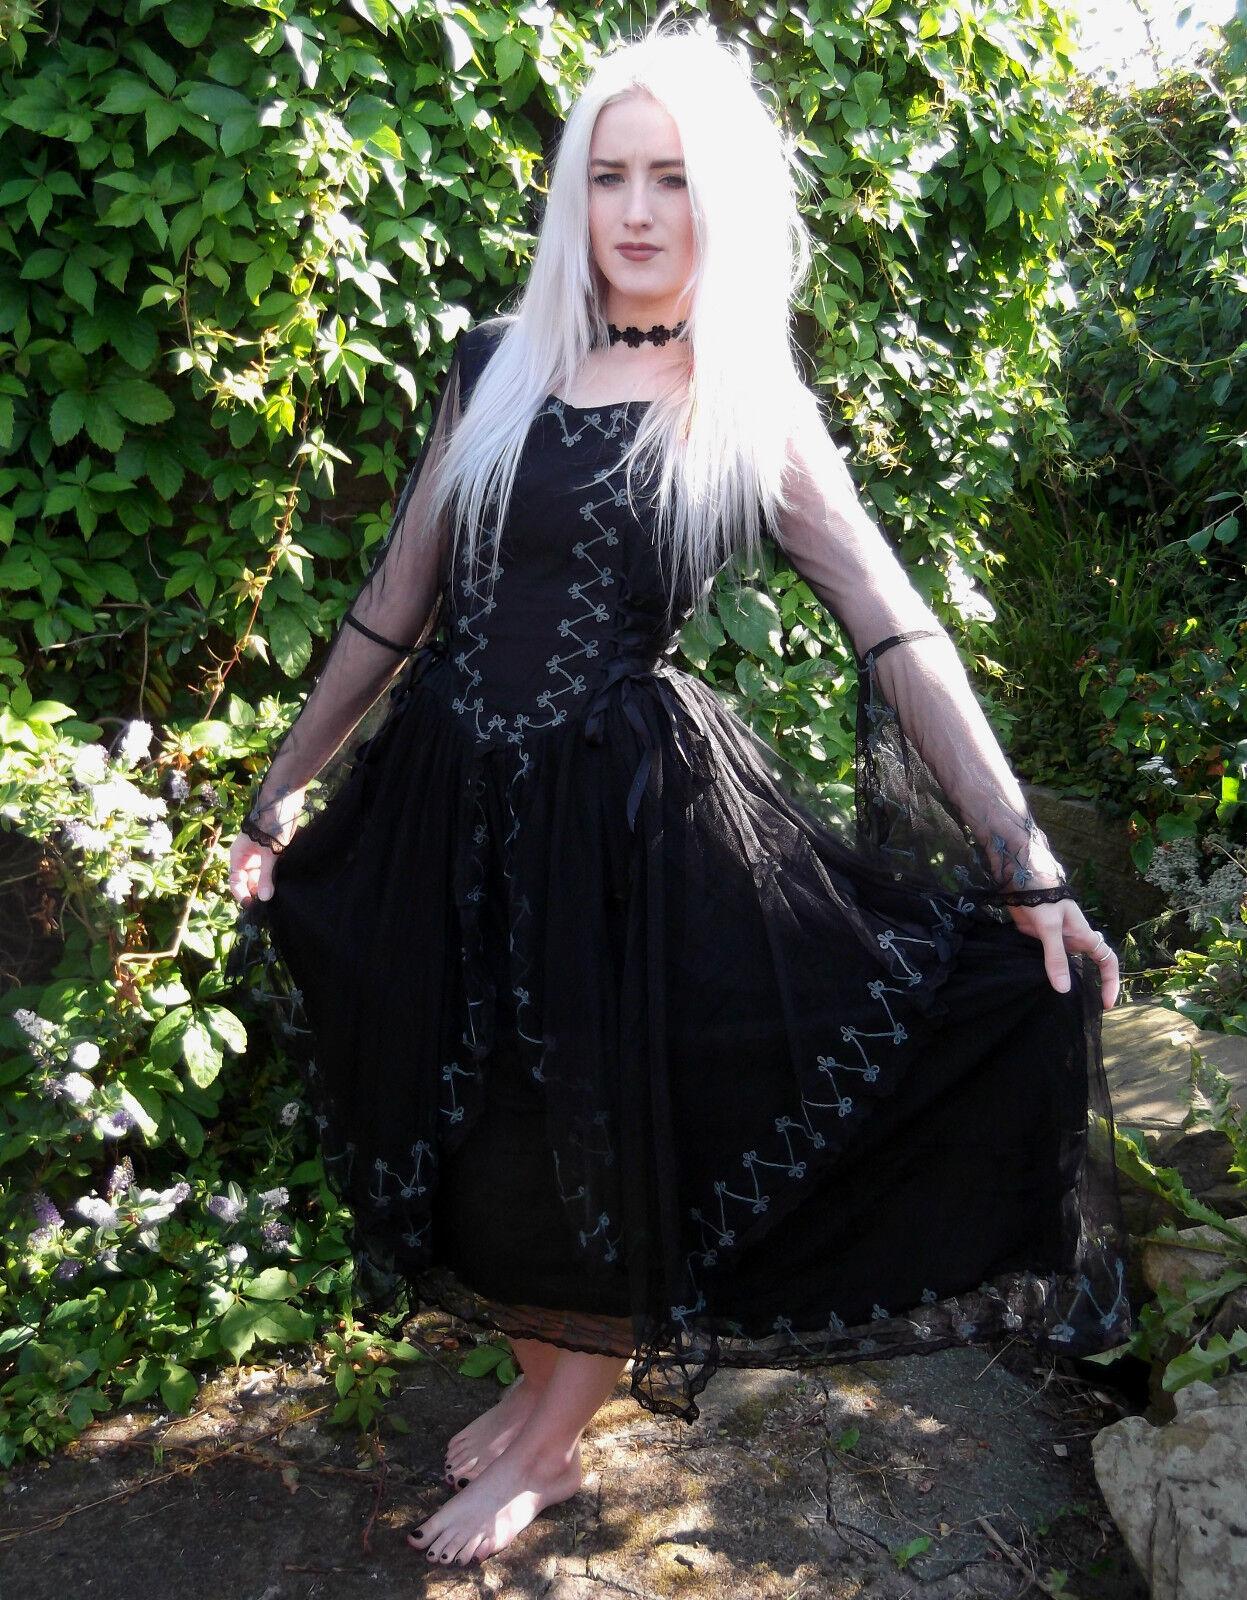 Dark Star Jordash Tie-Dye Tie-Dye Tie-Dye Bodice Dress Fairy Medieval Pagan Festival S M L-XL 34ade8